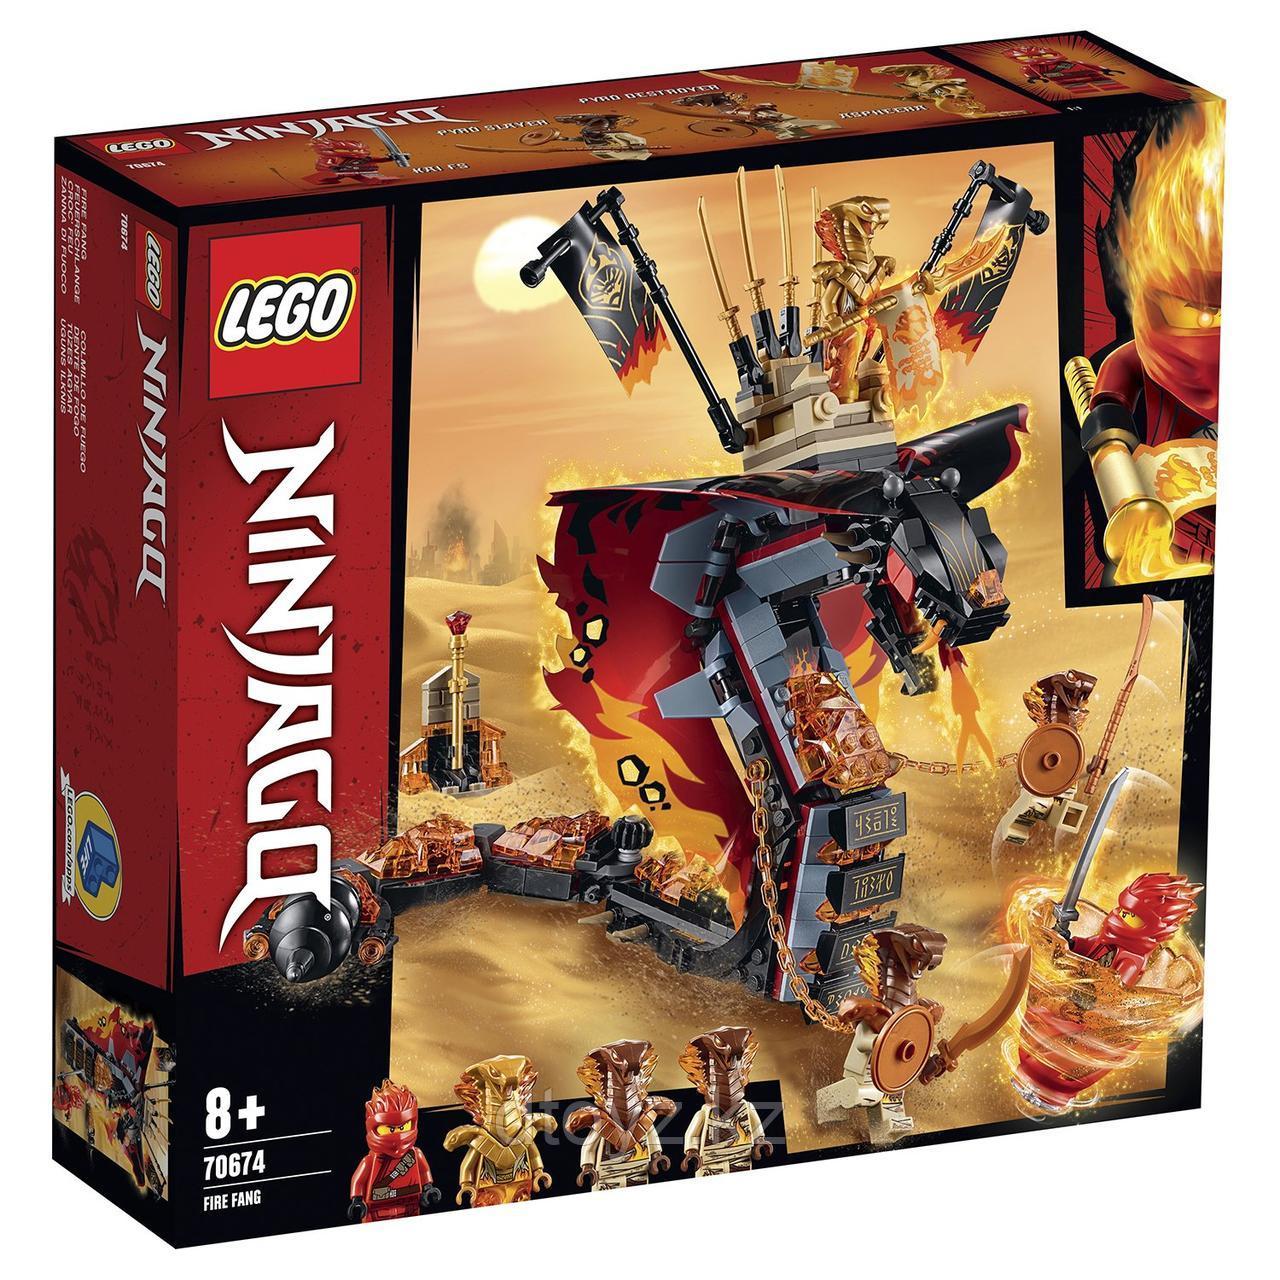 Lego Ninjago 70674 Огненный кинжал, Лего Ниндзяго - фото 1